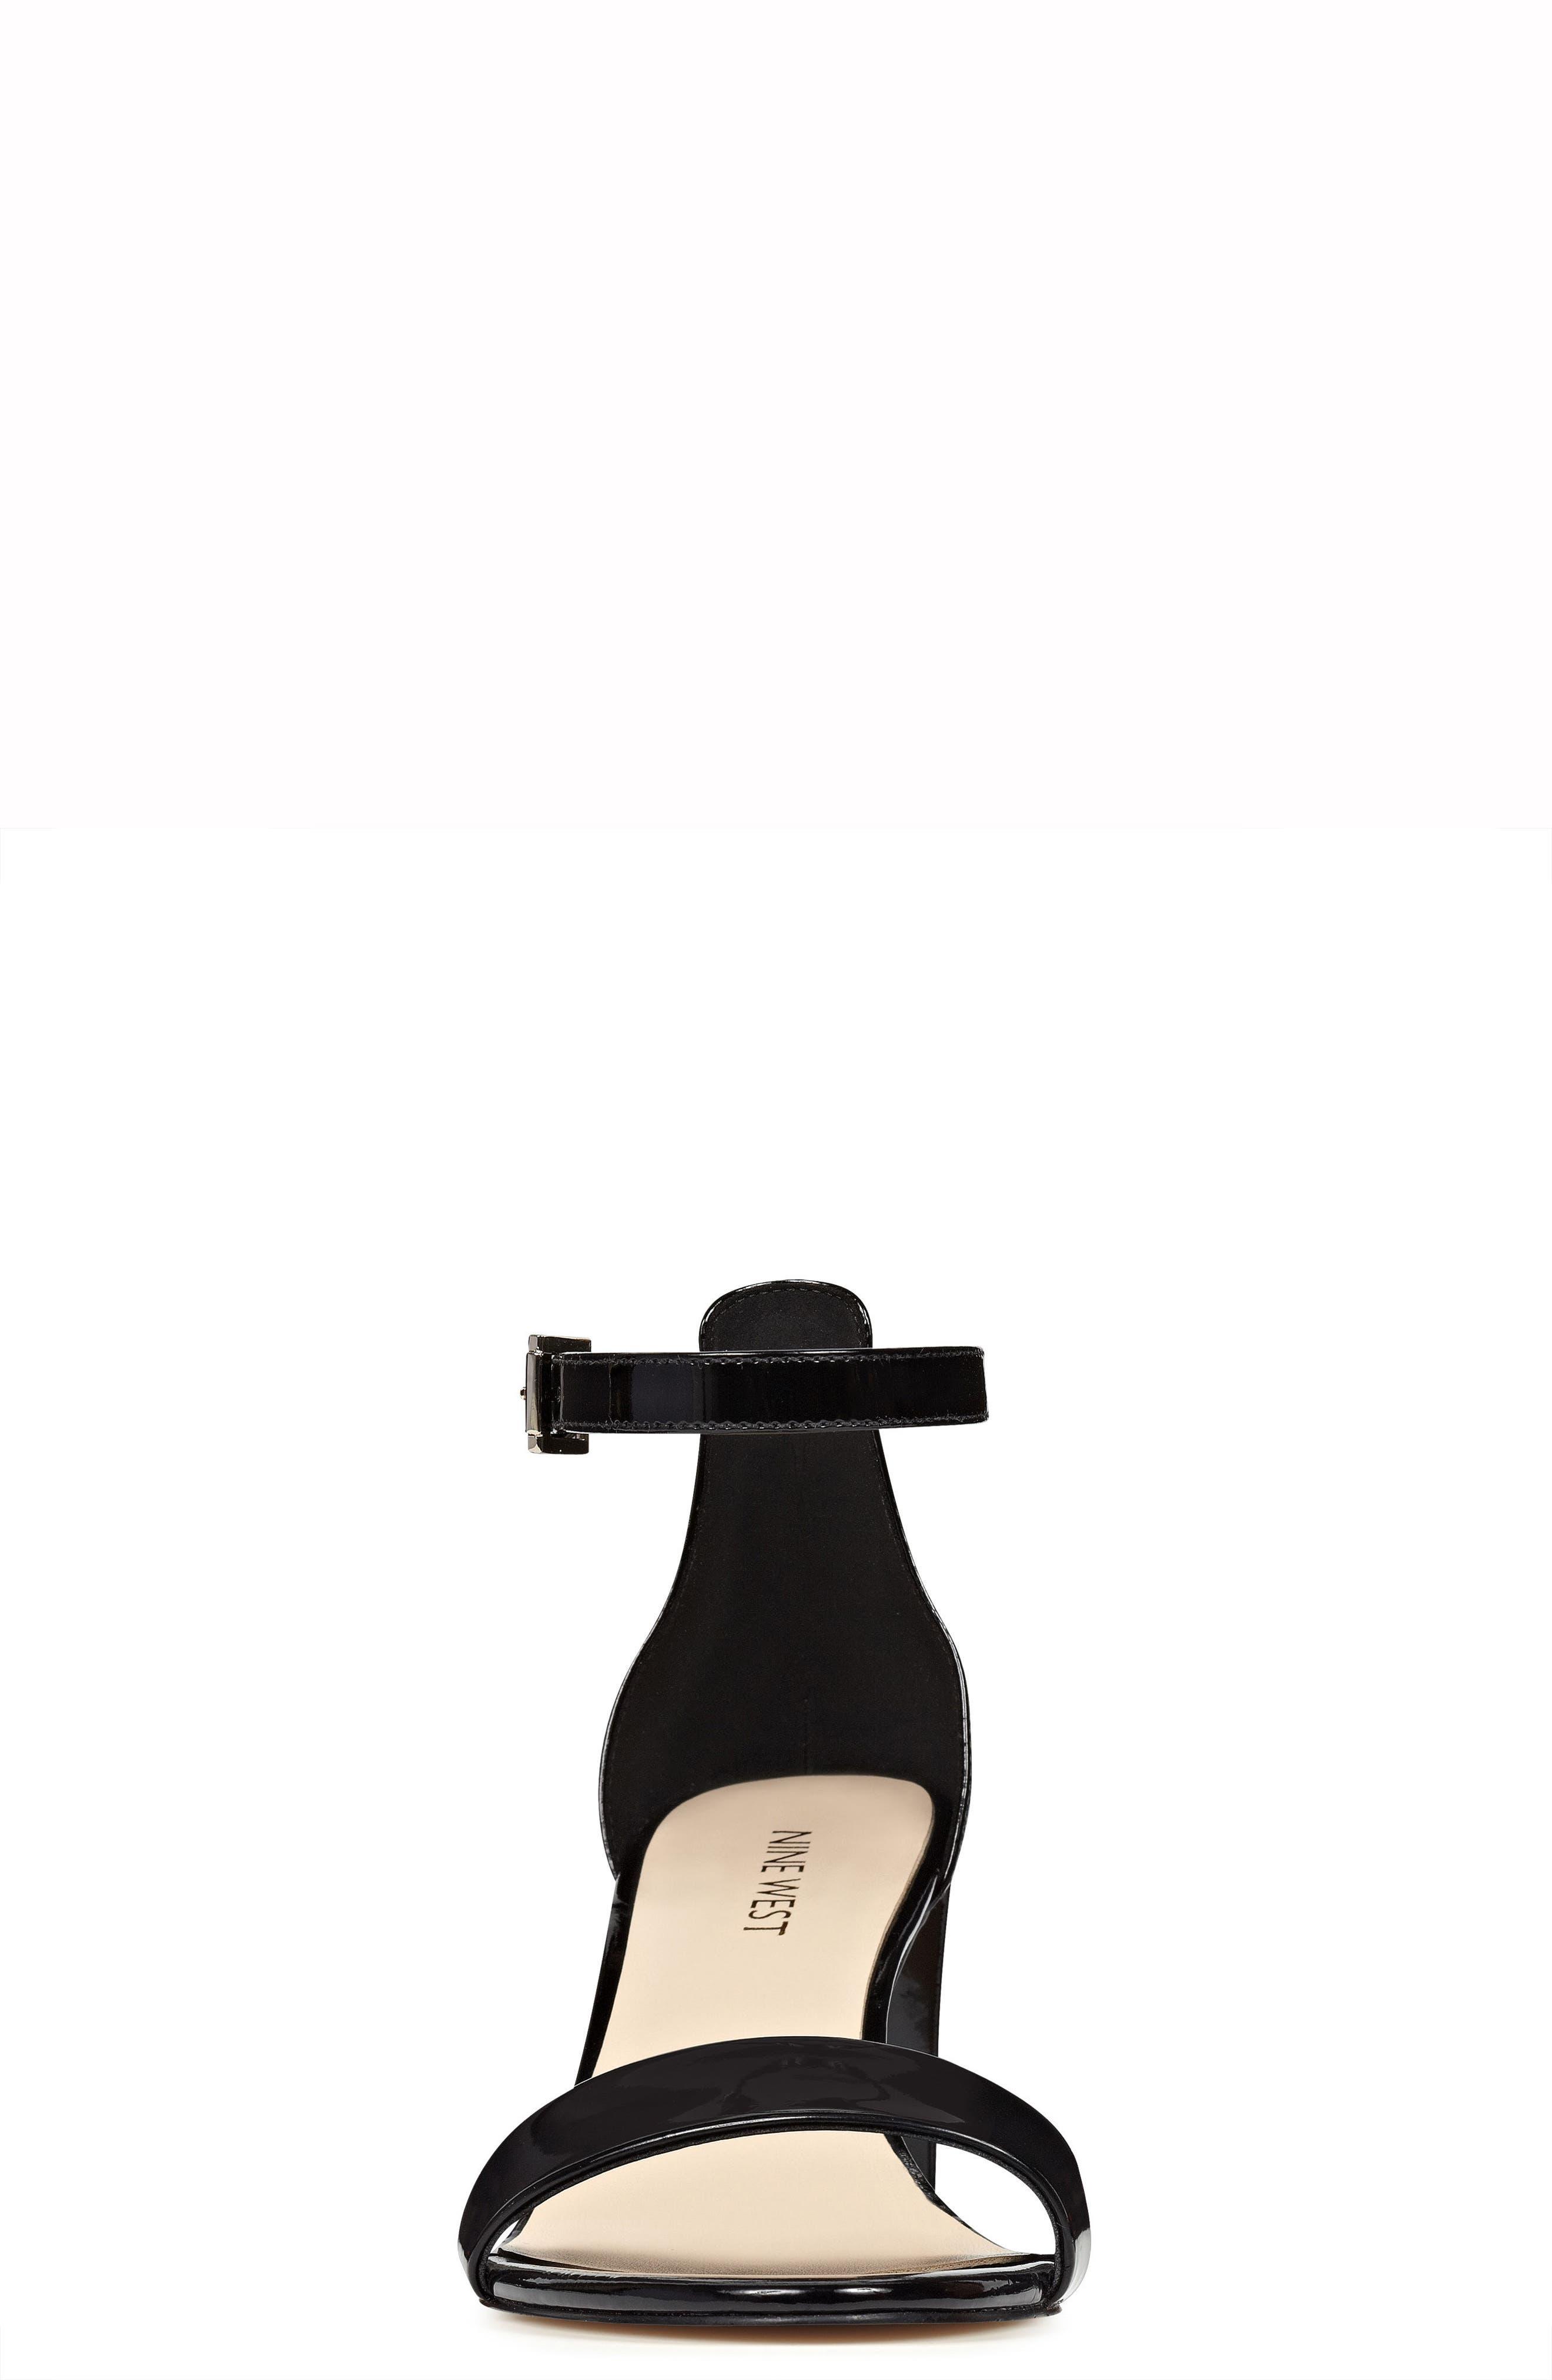 NINE WEST, Pruce Ankle Strap Sandal, Alternate thumbnail 4, color, BLACK PATENT